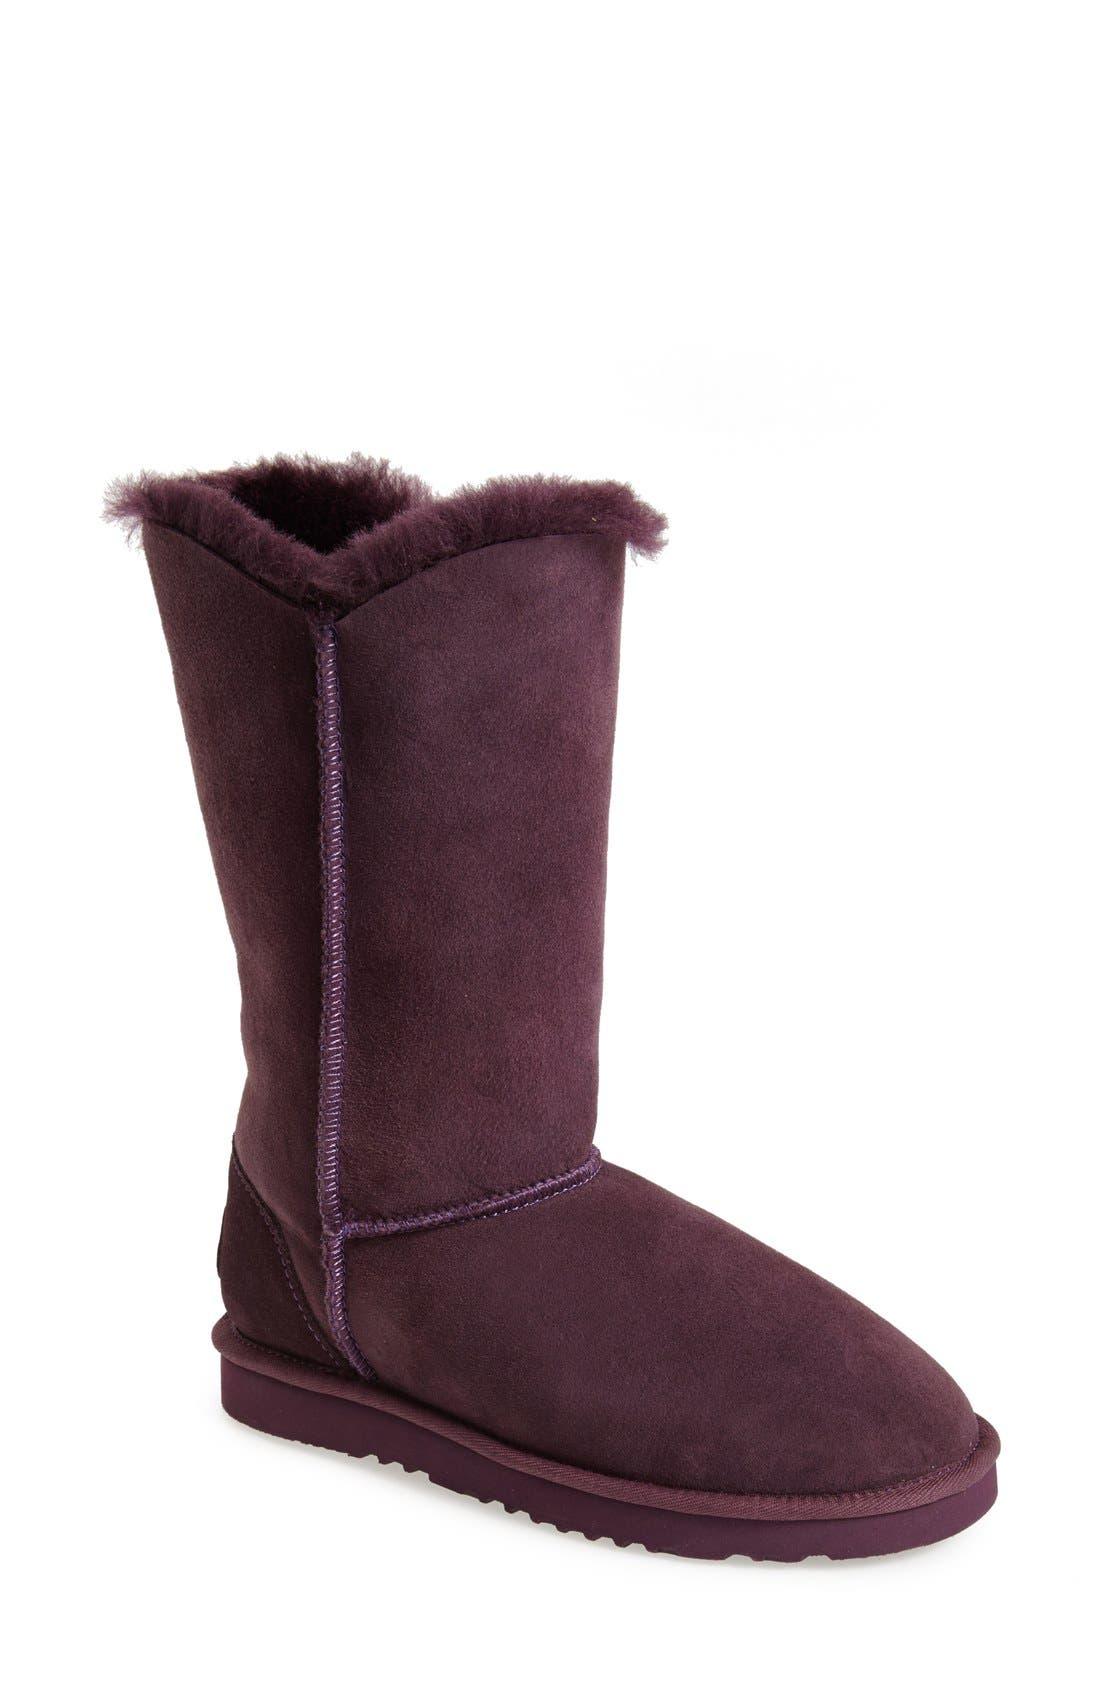 Main Image - Koolaburra 'Double Halo' Genuine Shearling Boot (Women)